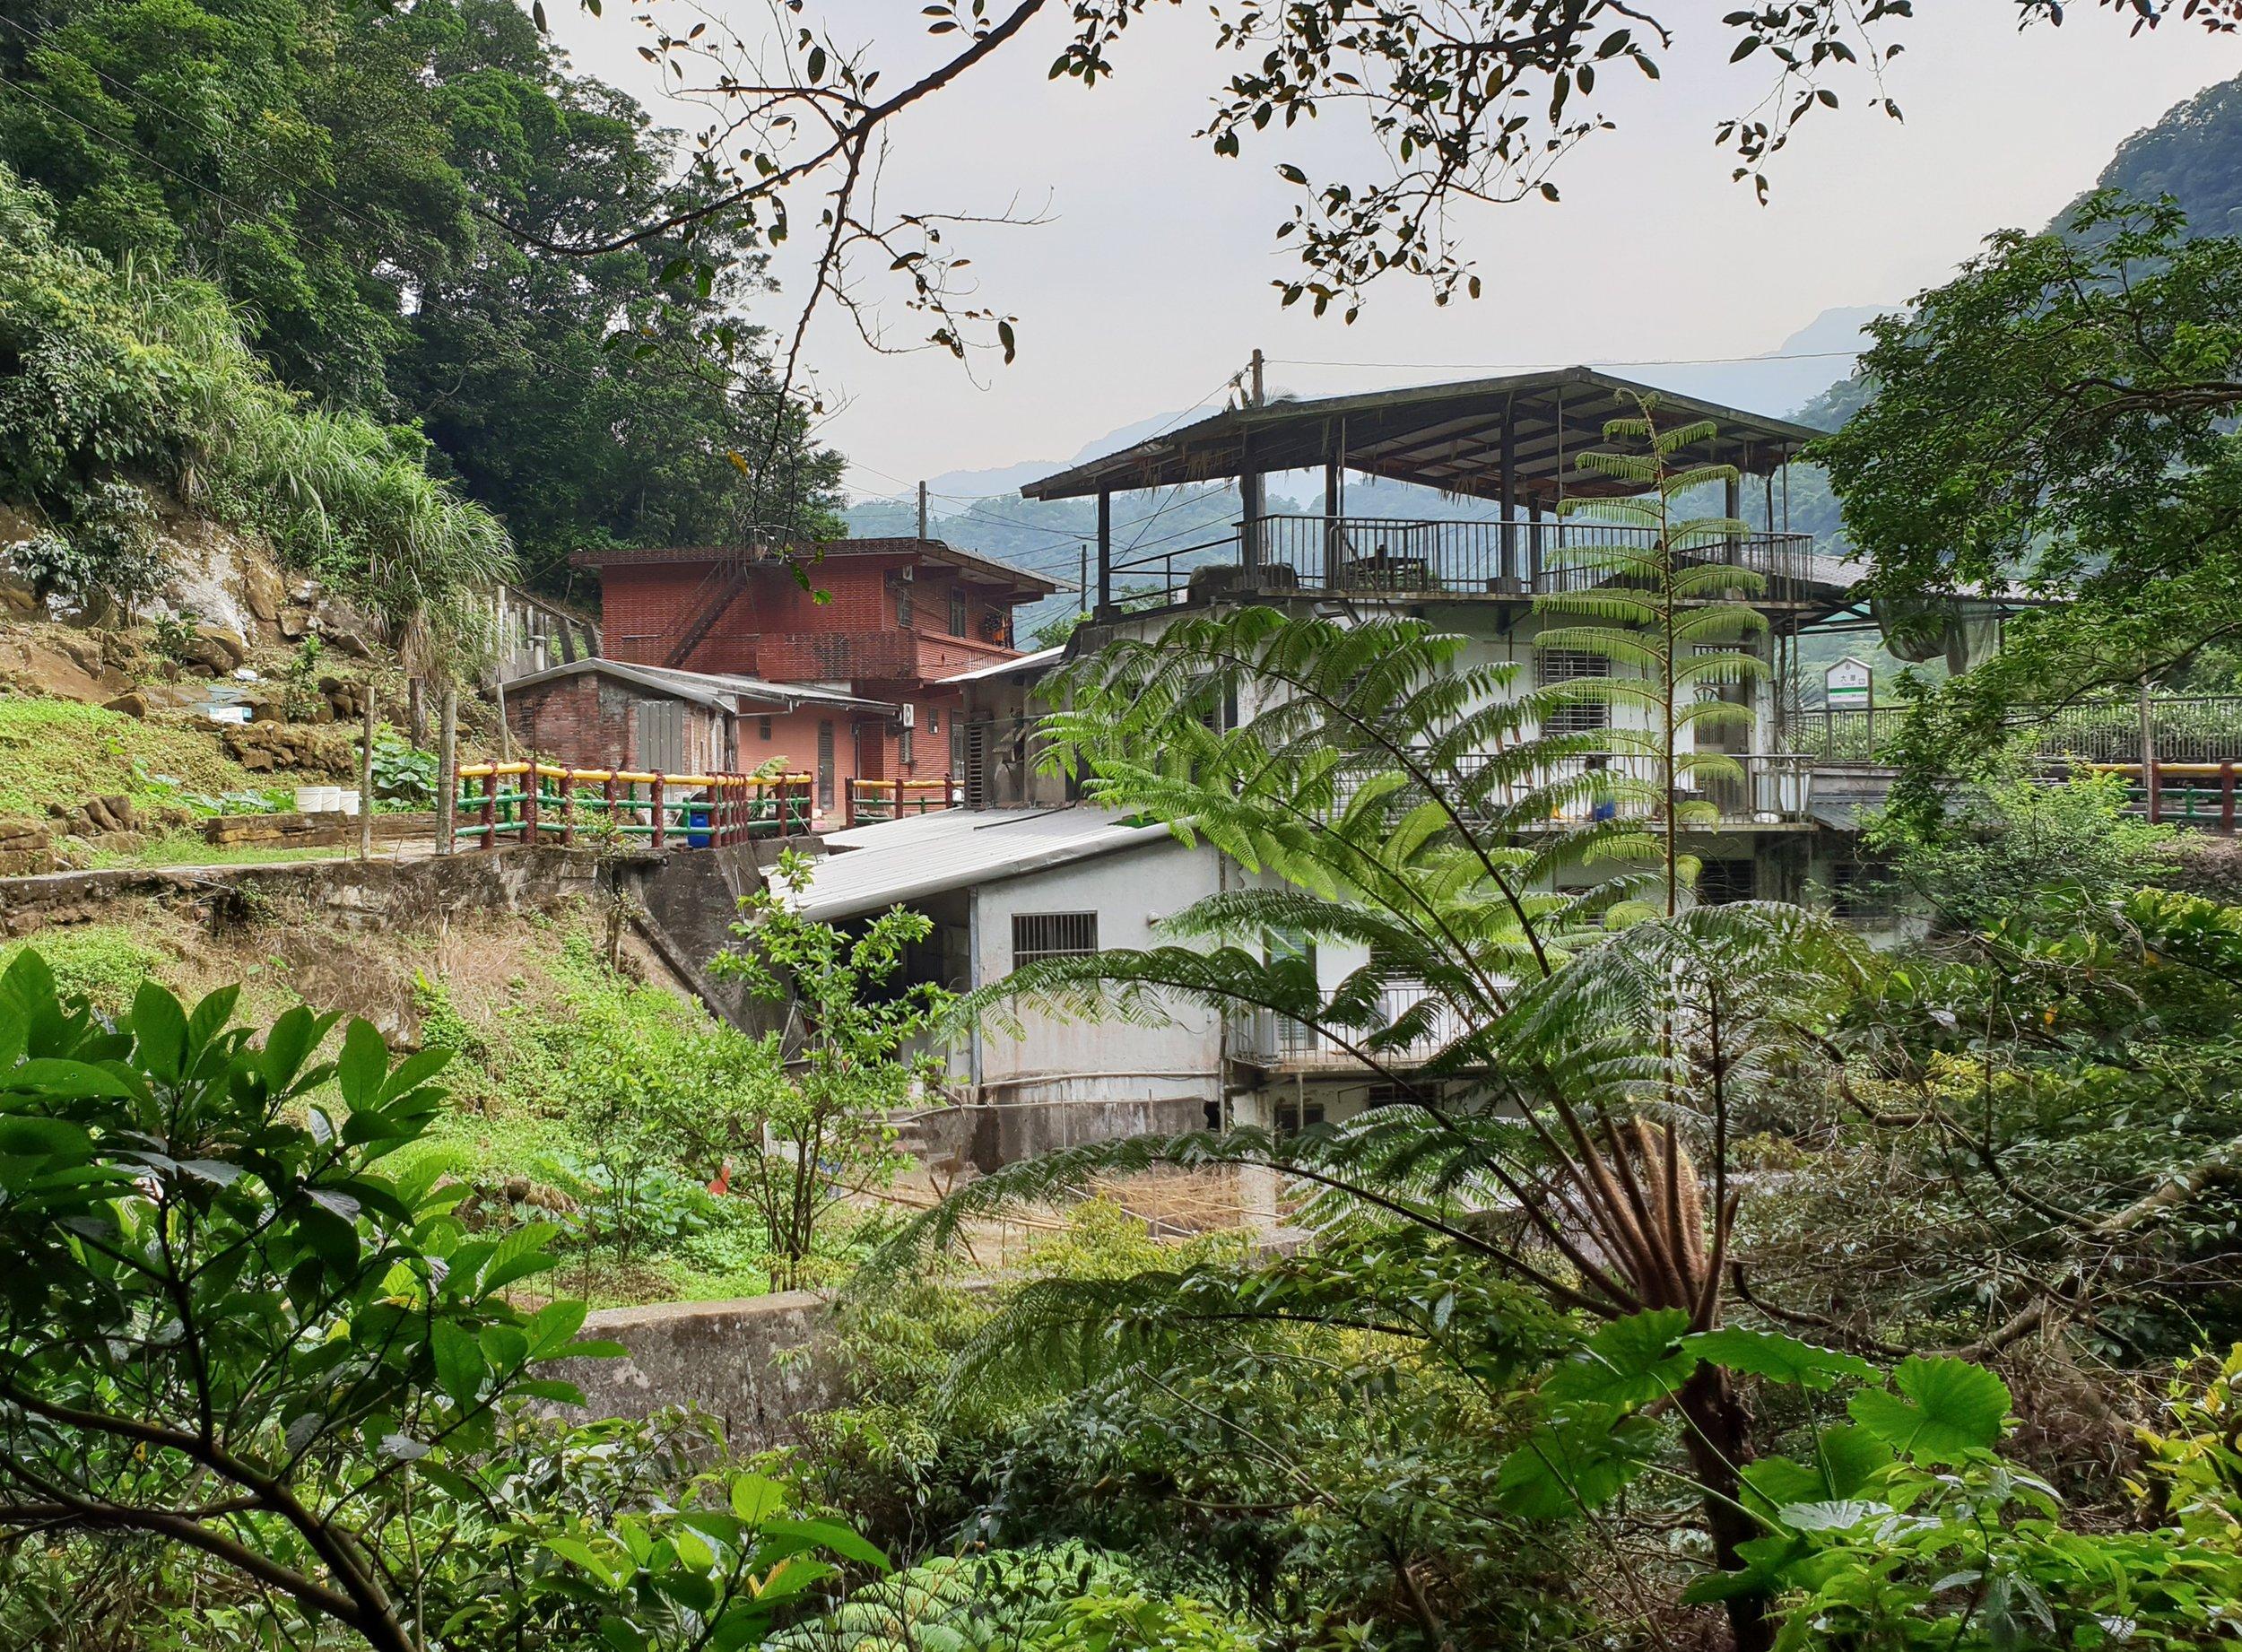 Most of tiny Dahua Village